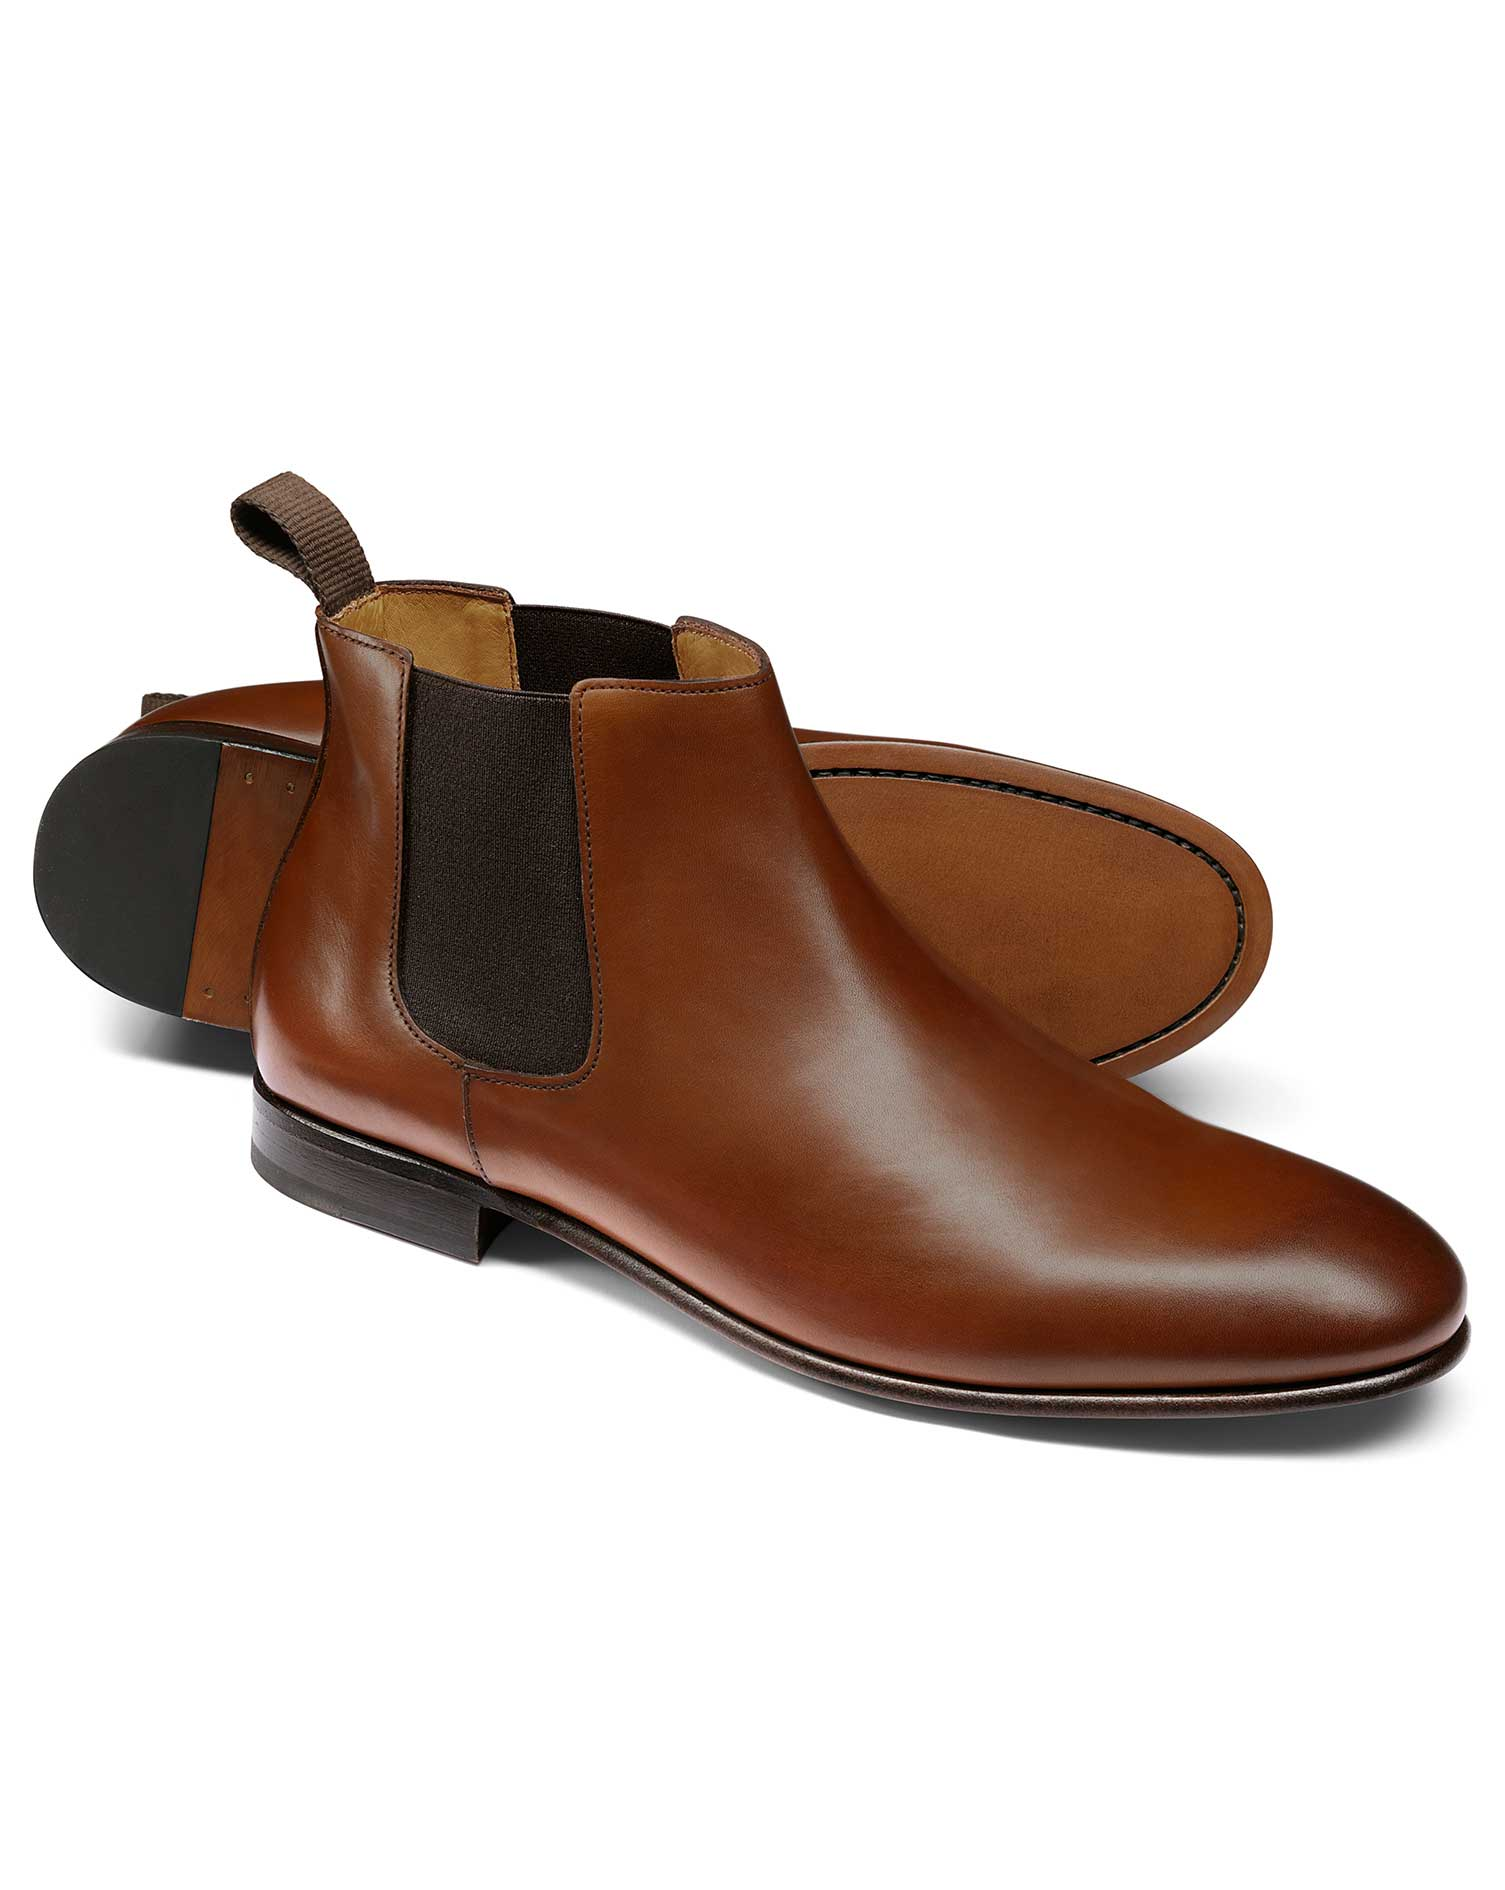 Tan Chelsea Boot Size 9 R by Charles Tyrwhitt